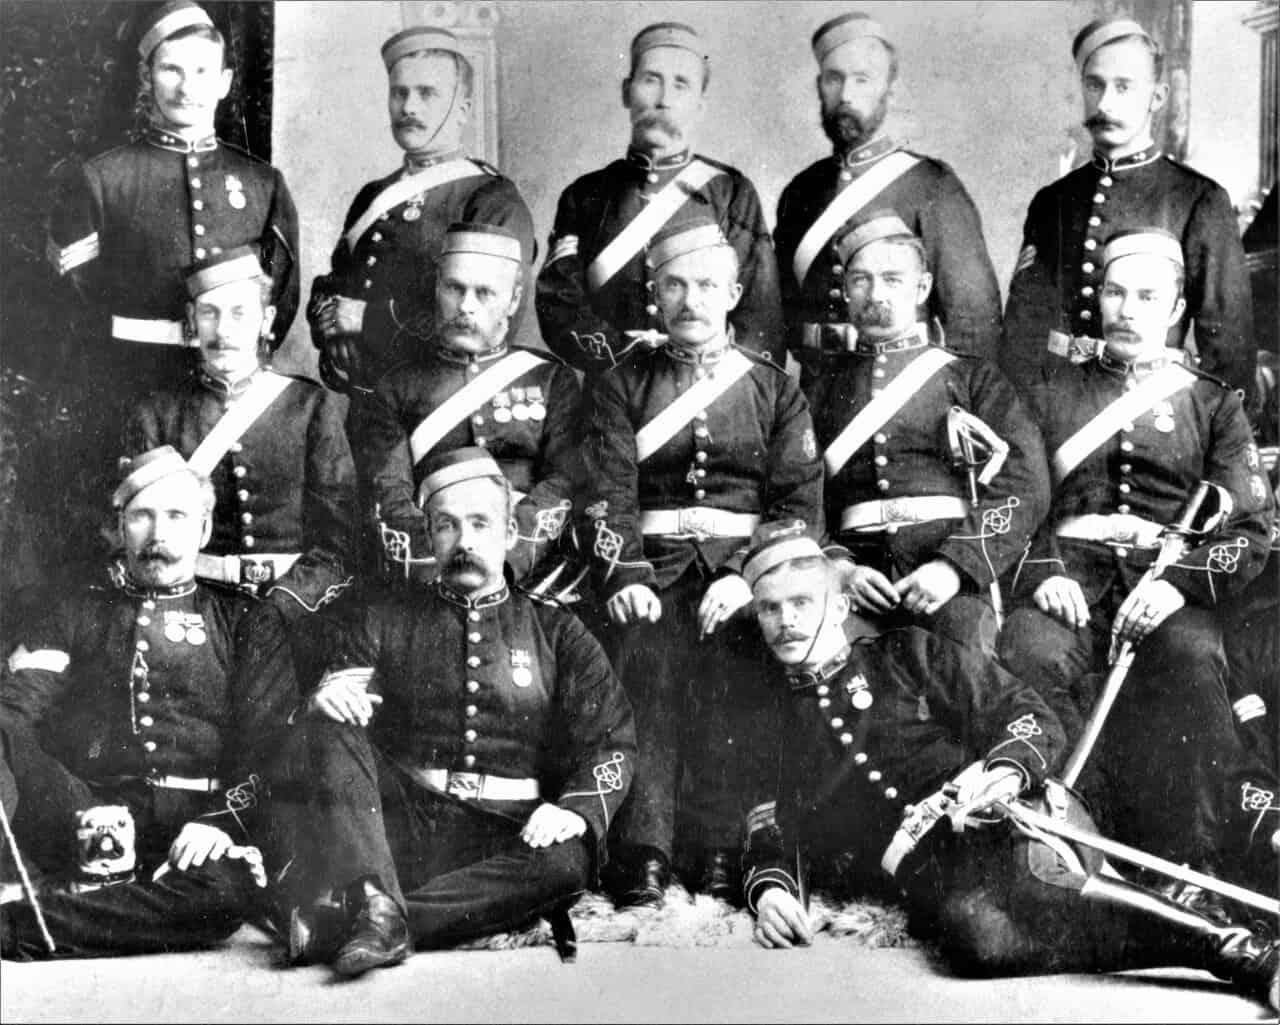 1887-Staff-Sergeants-and-Sergeants-A-Battery